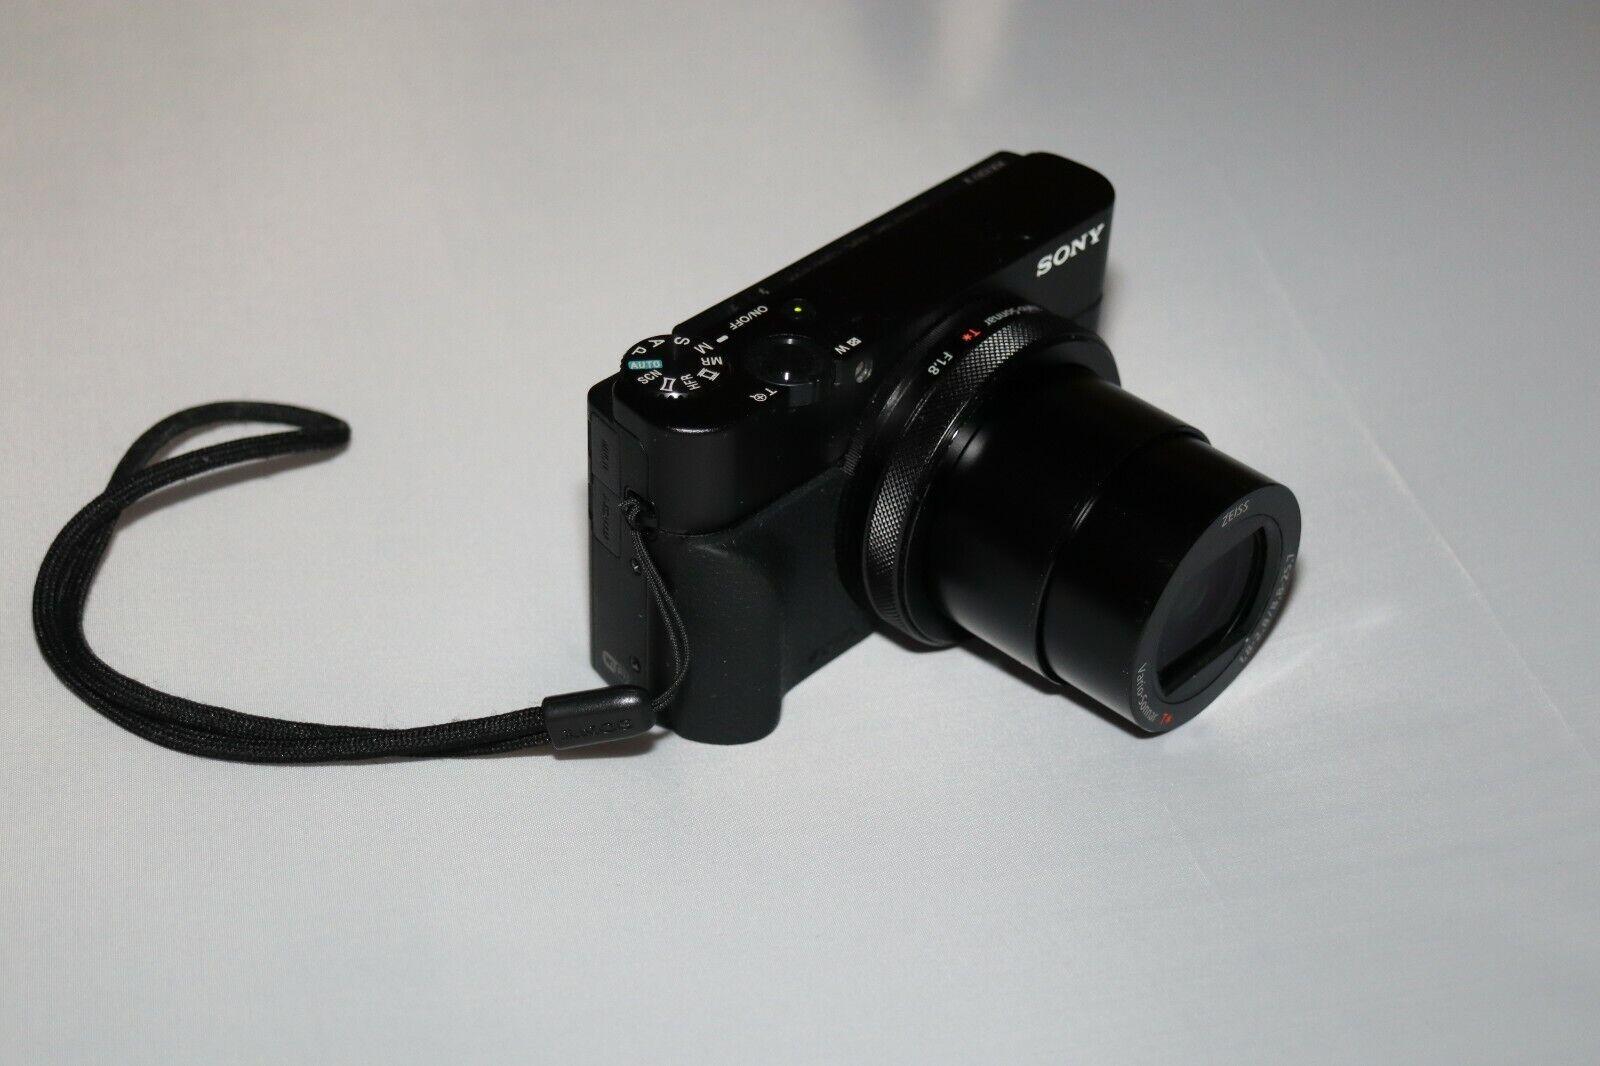 Sony Cyber-shot RX100 V 20.1MP Digital Camera - Black Kit W/ 24-70mm Lens  - $500.00